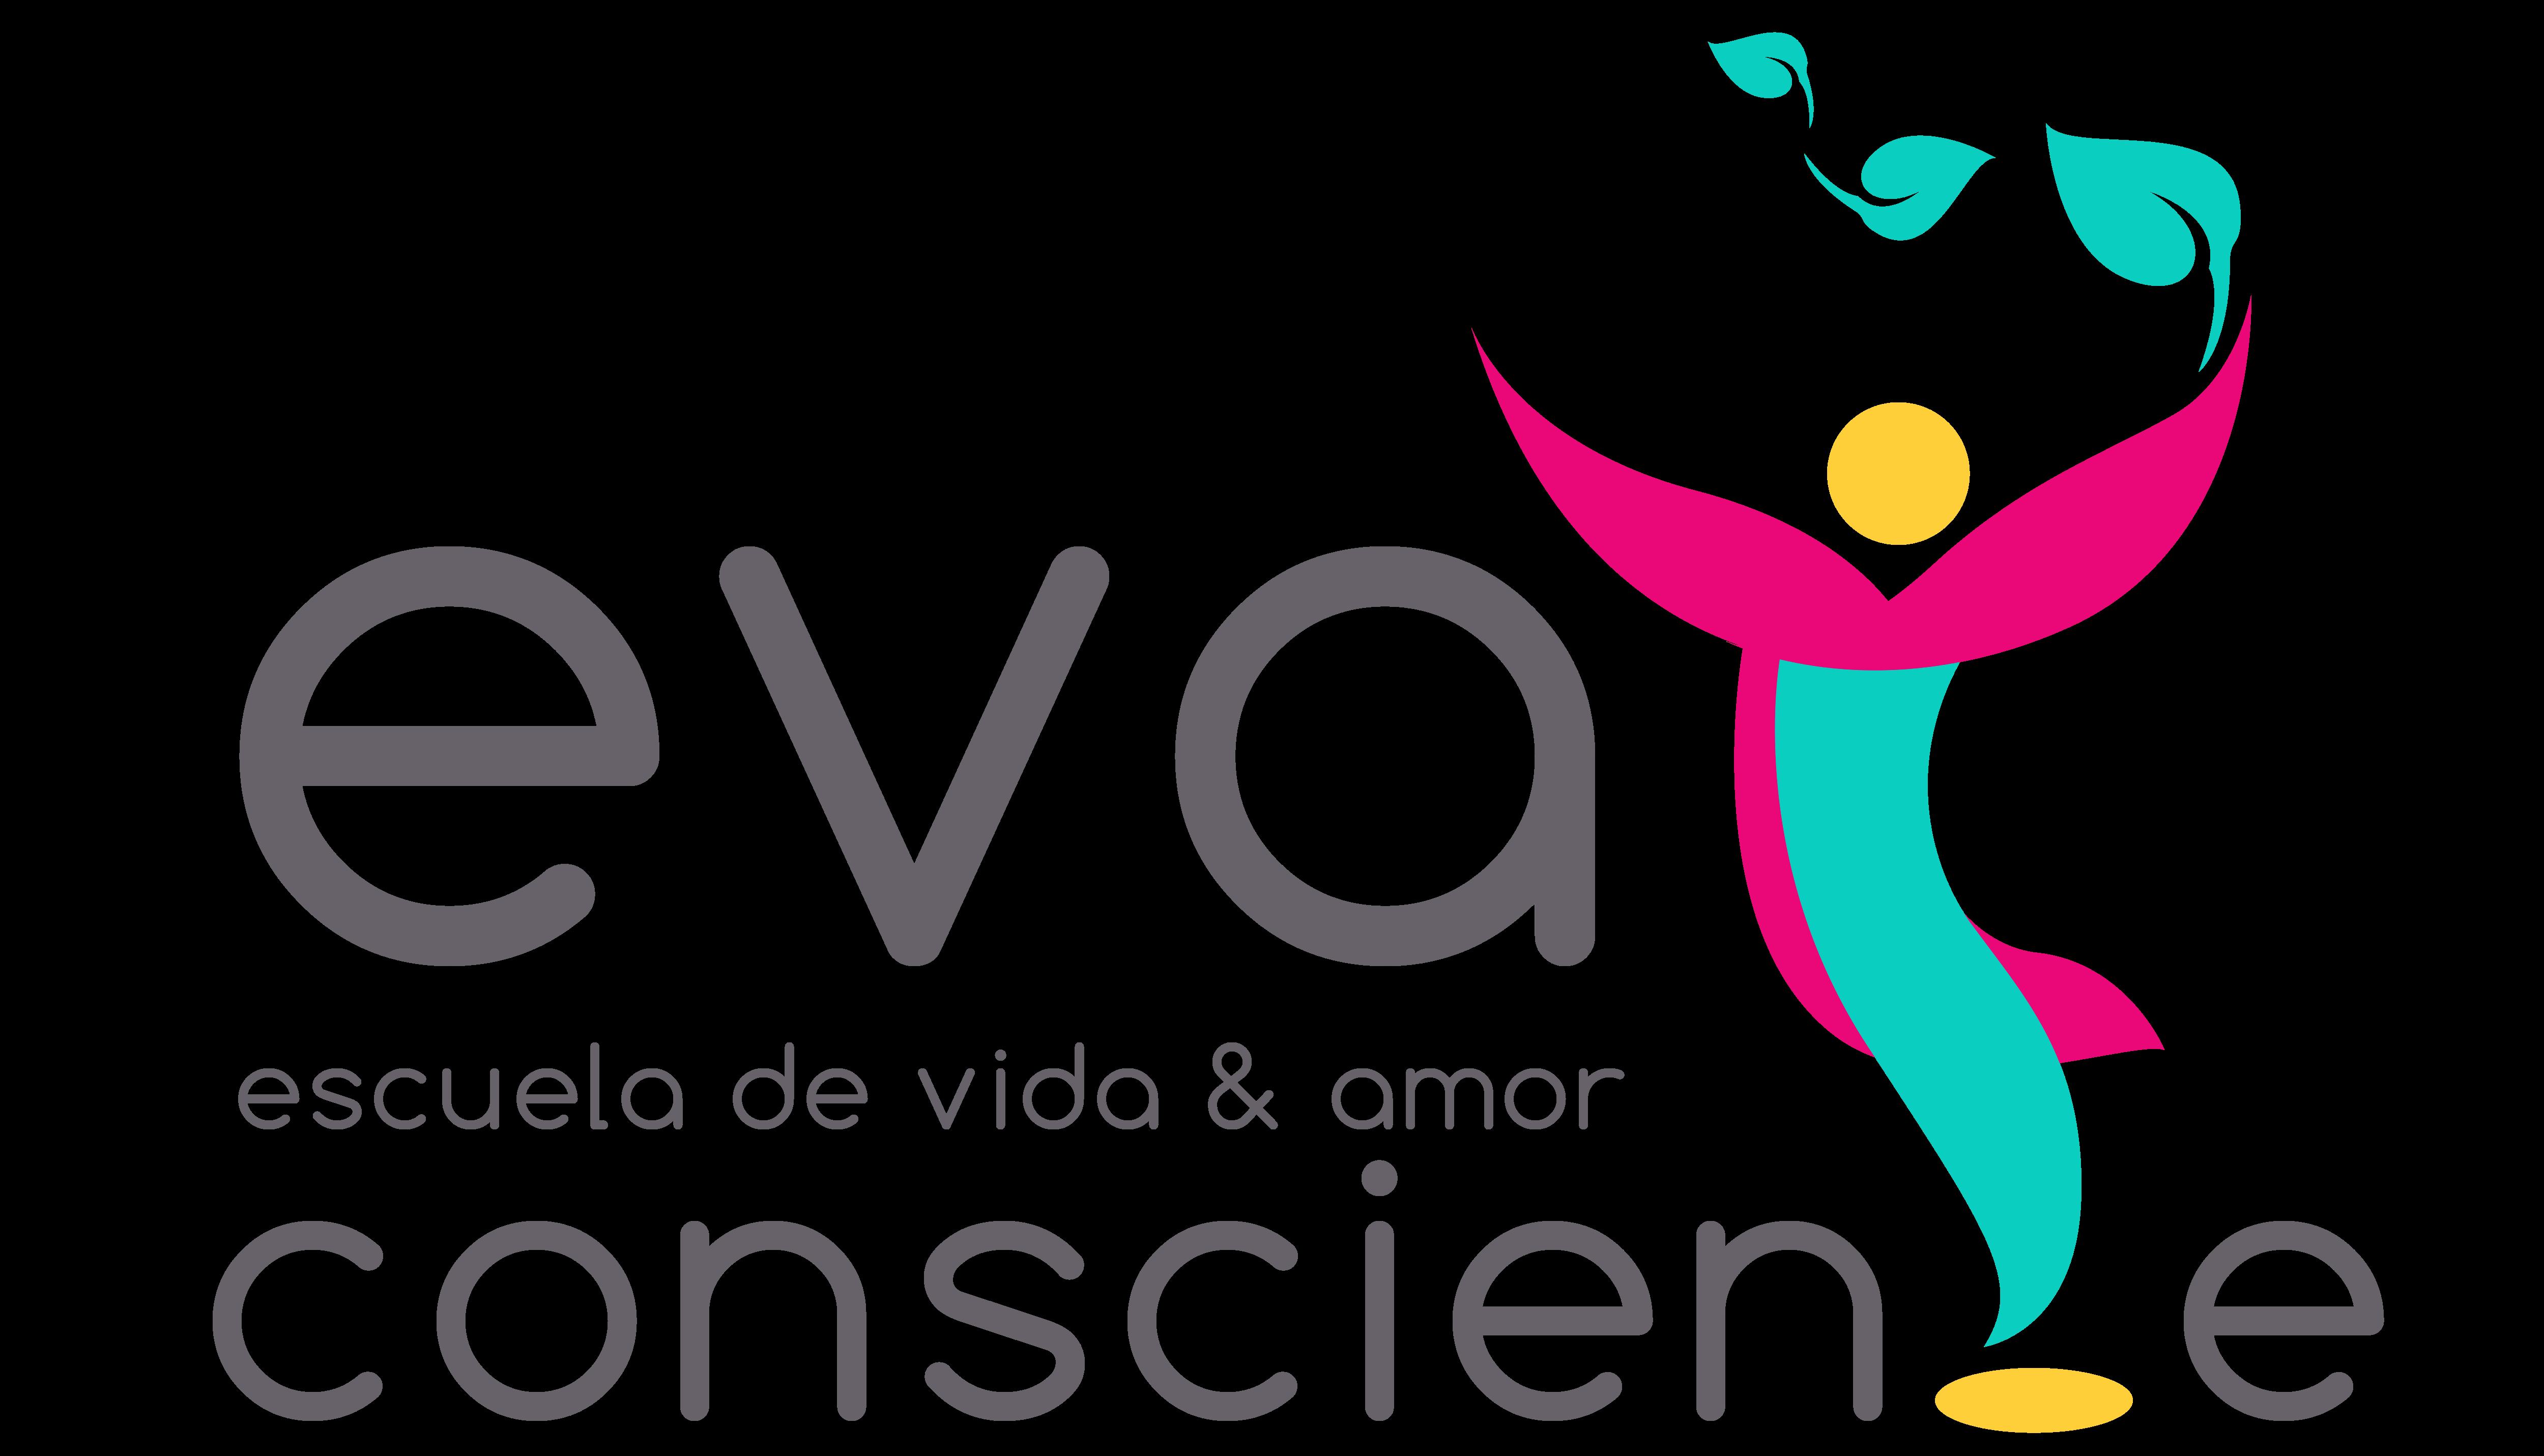 Eva Consciente